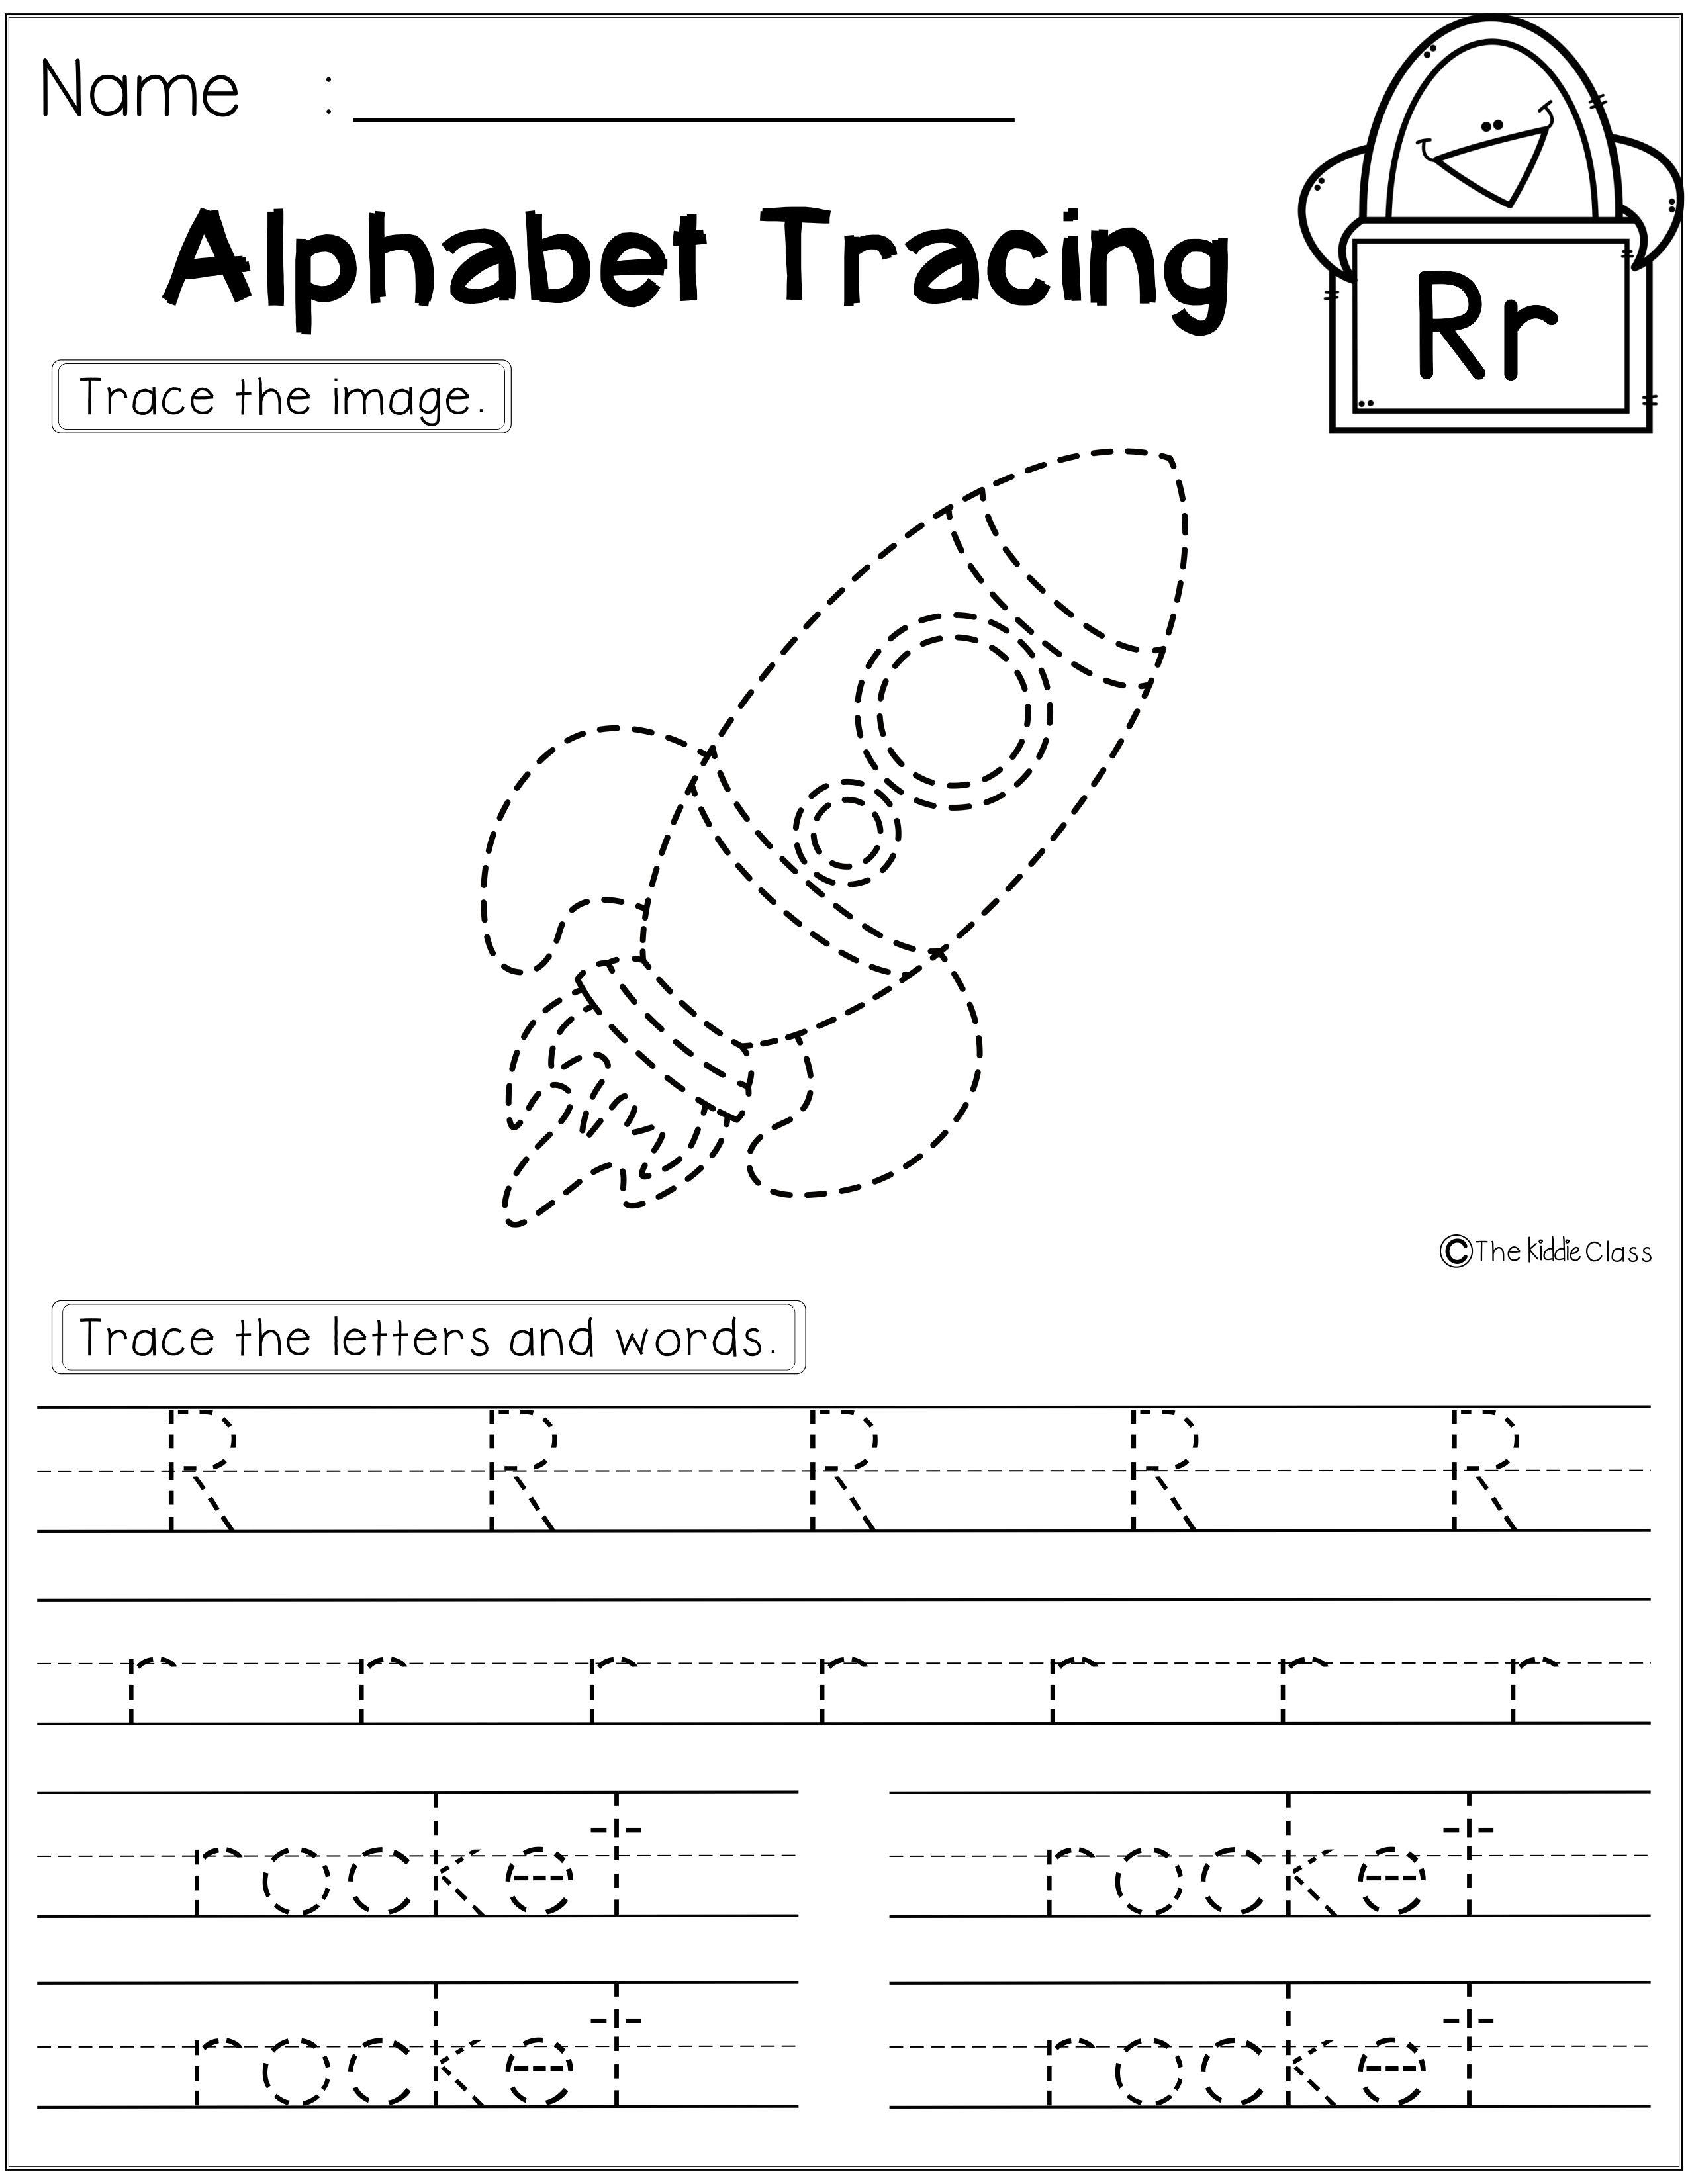 Free Alphabet Tracing Activities